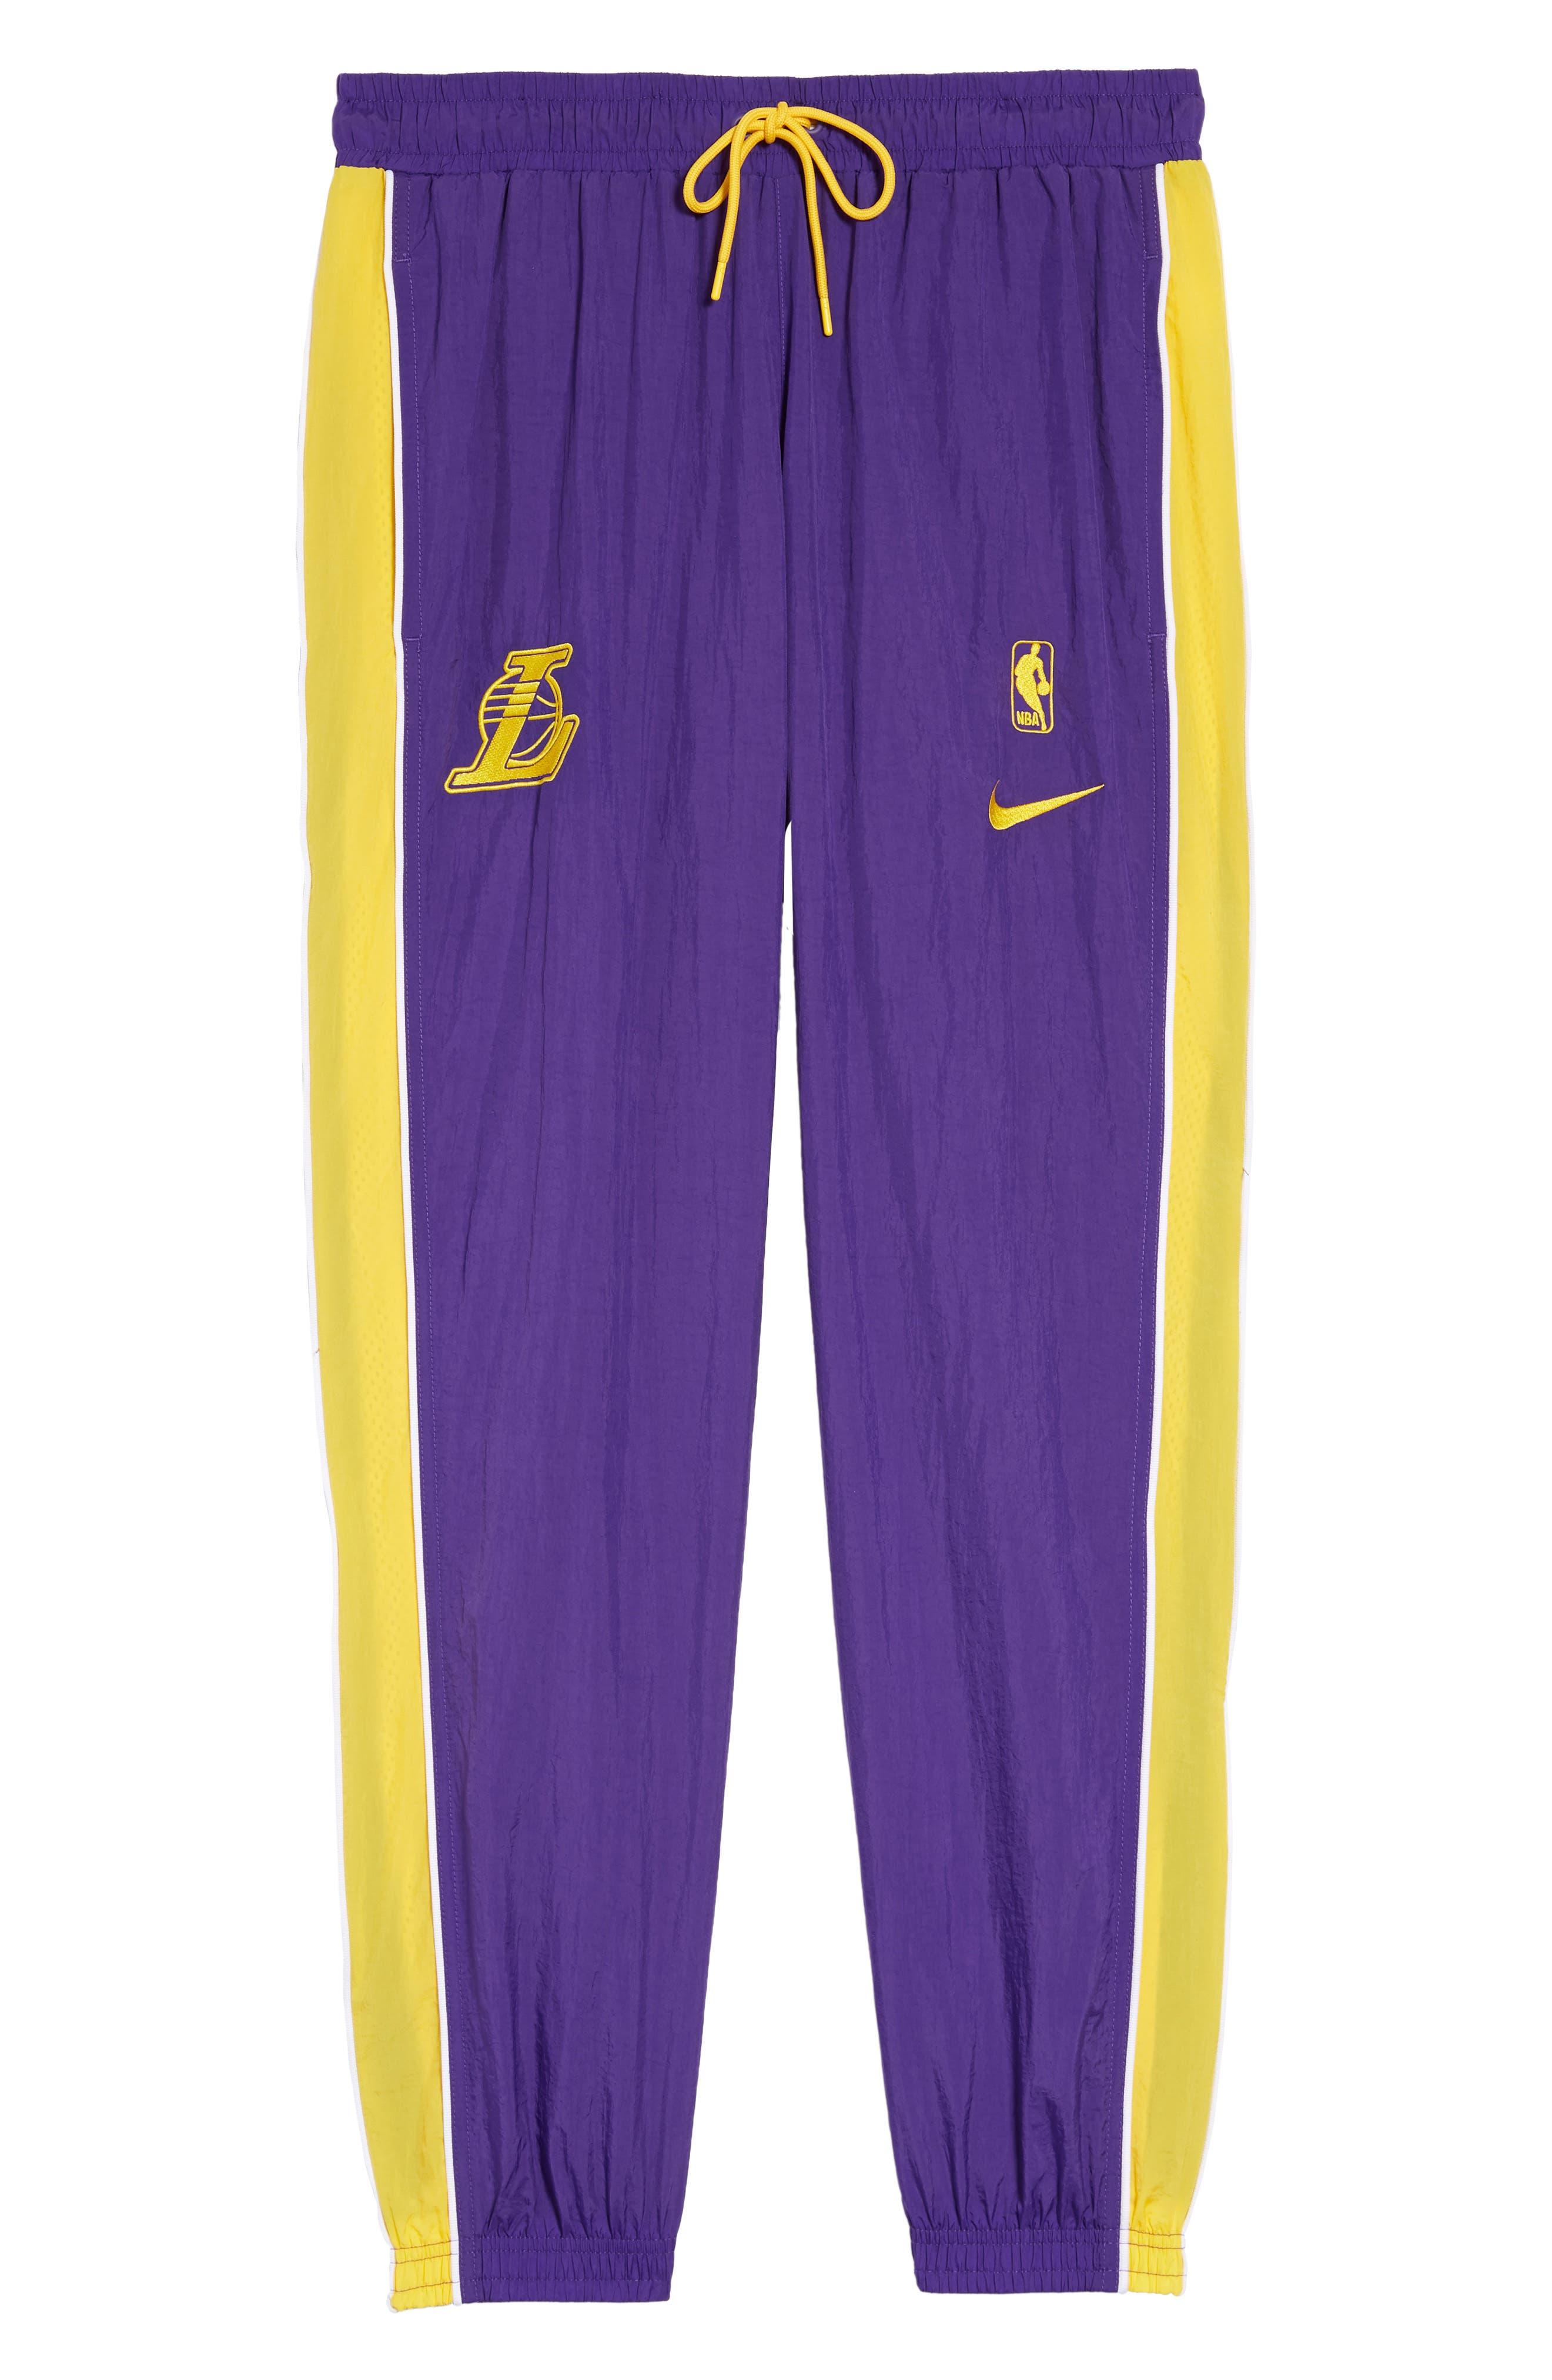 LA Lakers Tracksuit Pants,                             Alternate thumbnail 6, color,                             504